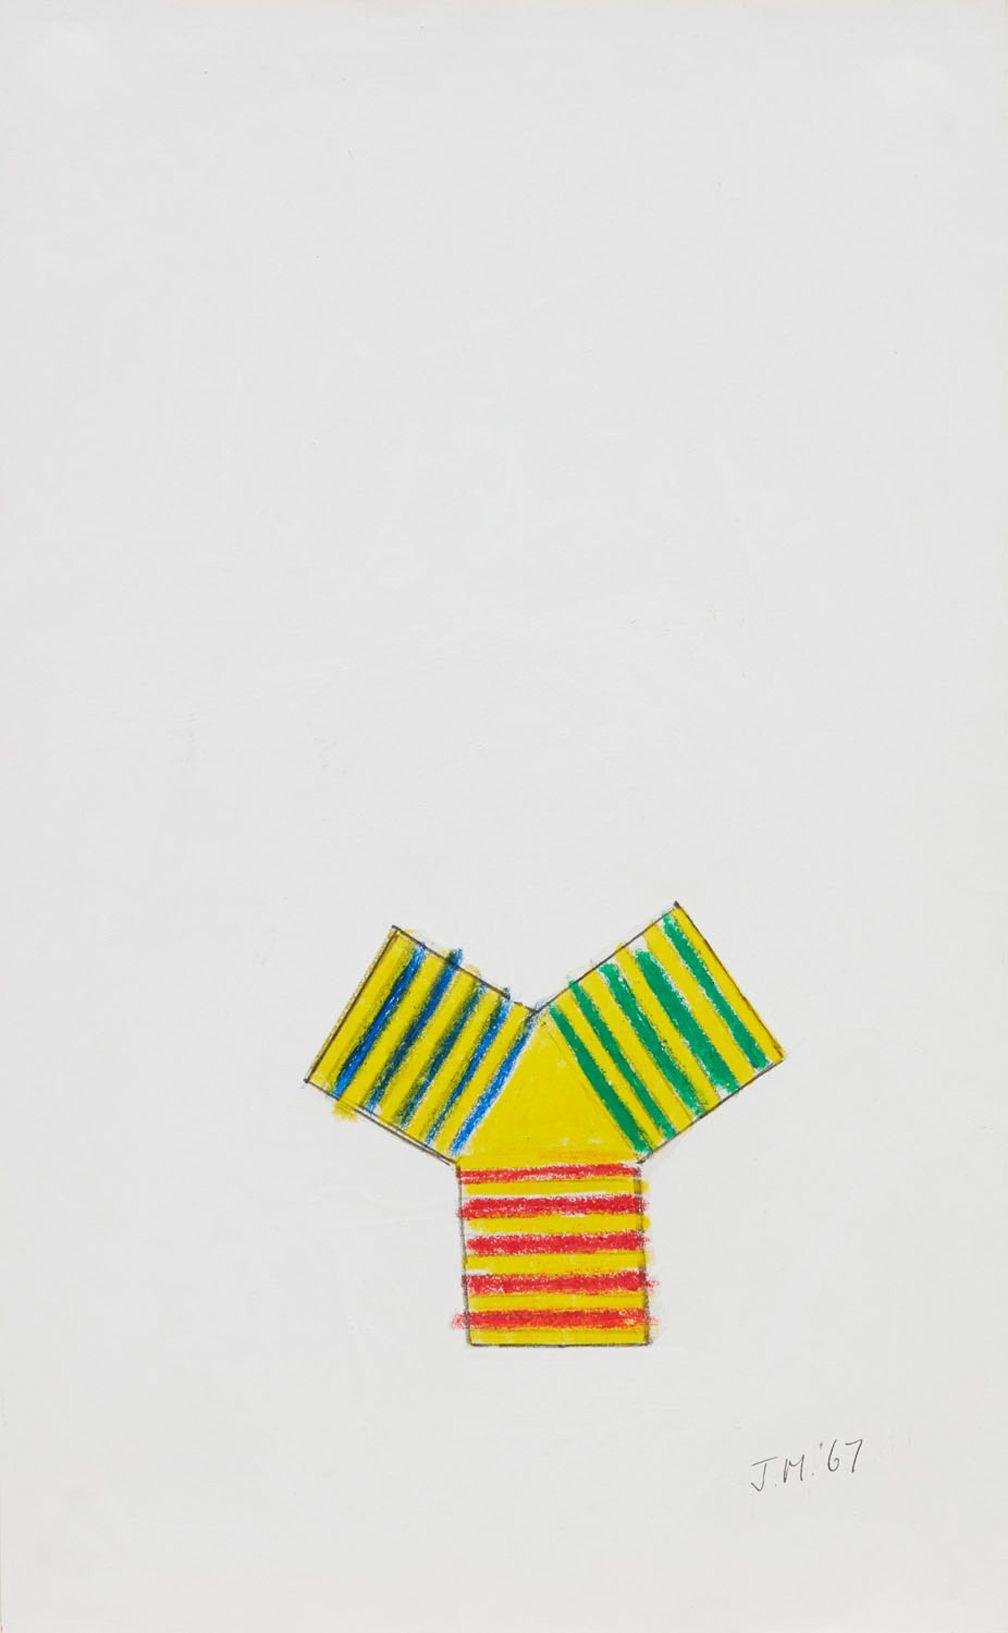 Jeremy Moon, Drawing [67],1967